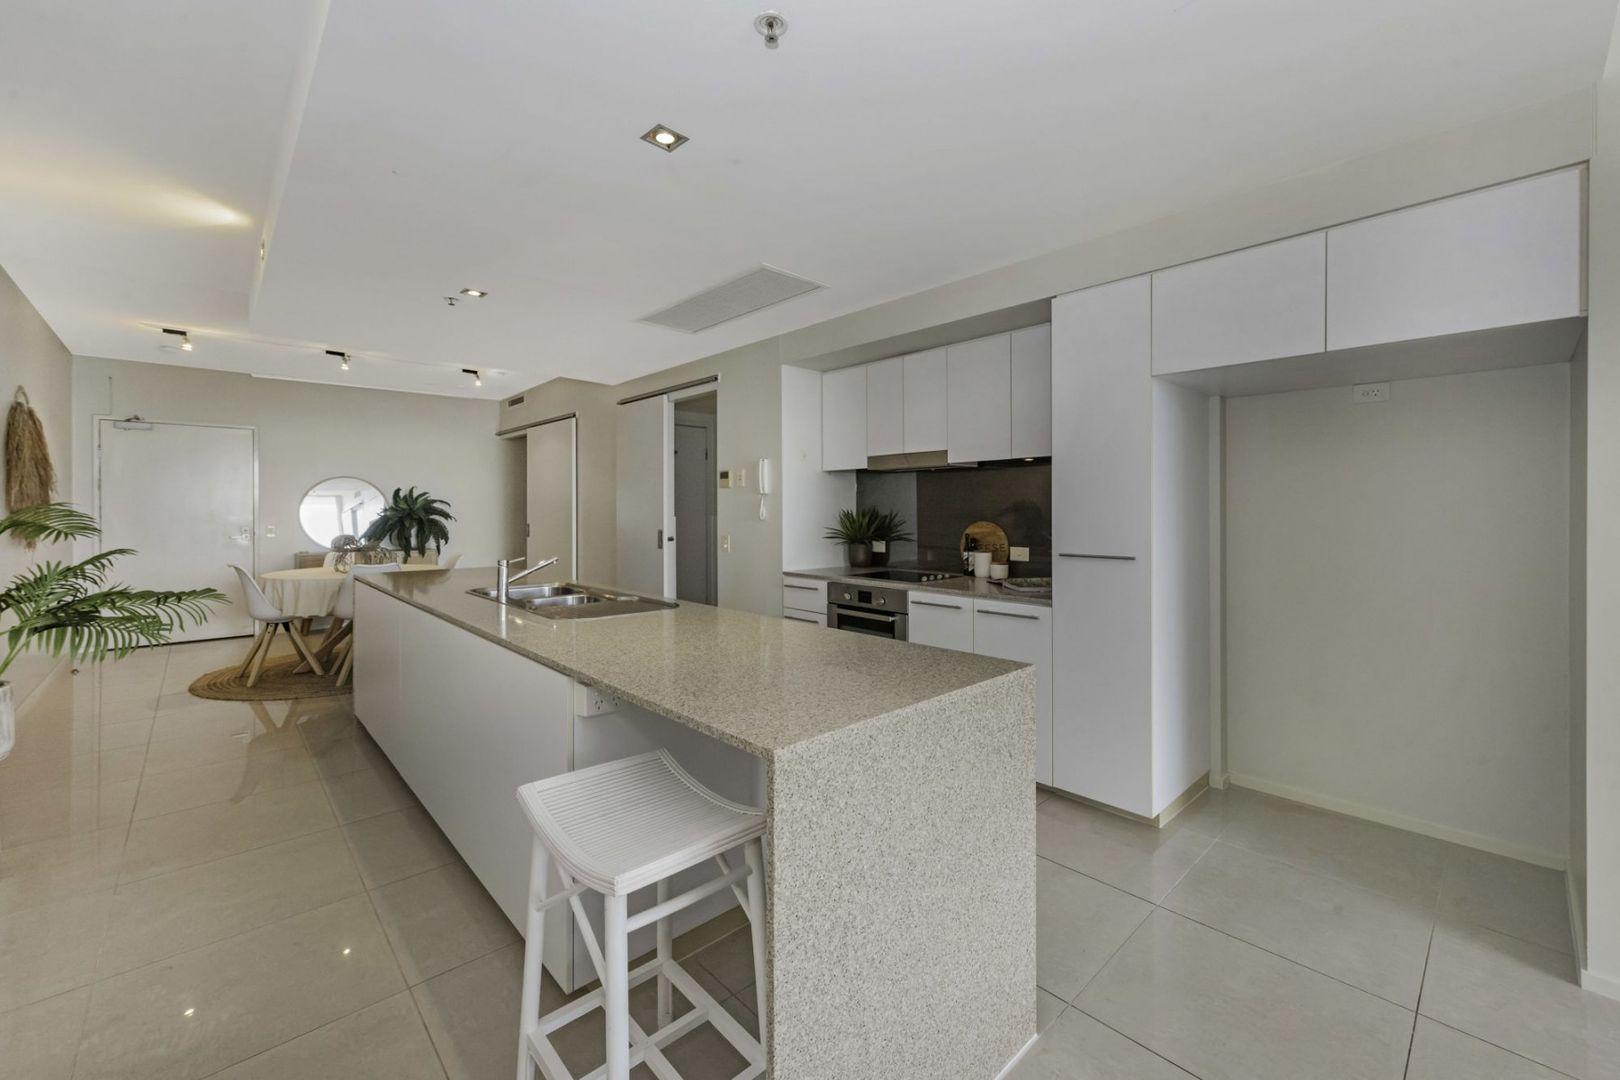 25/26 River Street, Mackay QLD 4740, Image 2